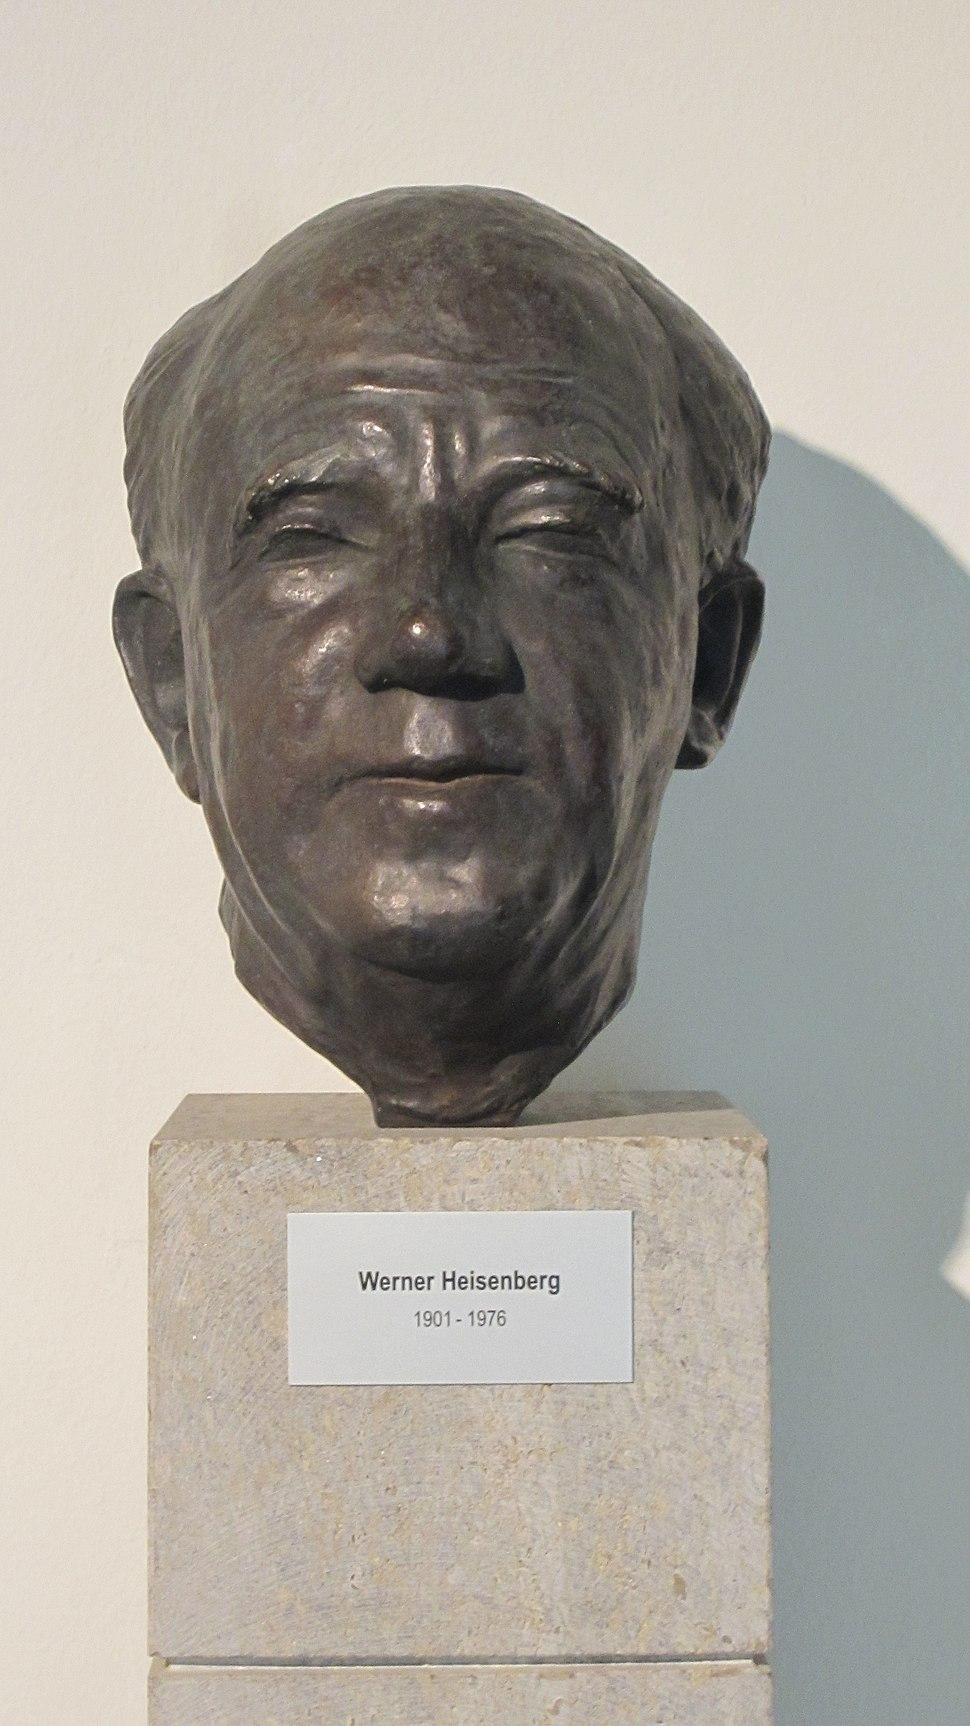 Werner Heisenberg bust